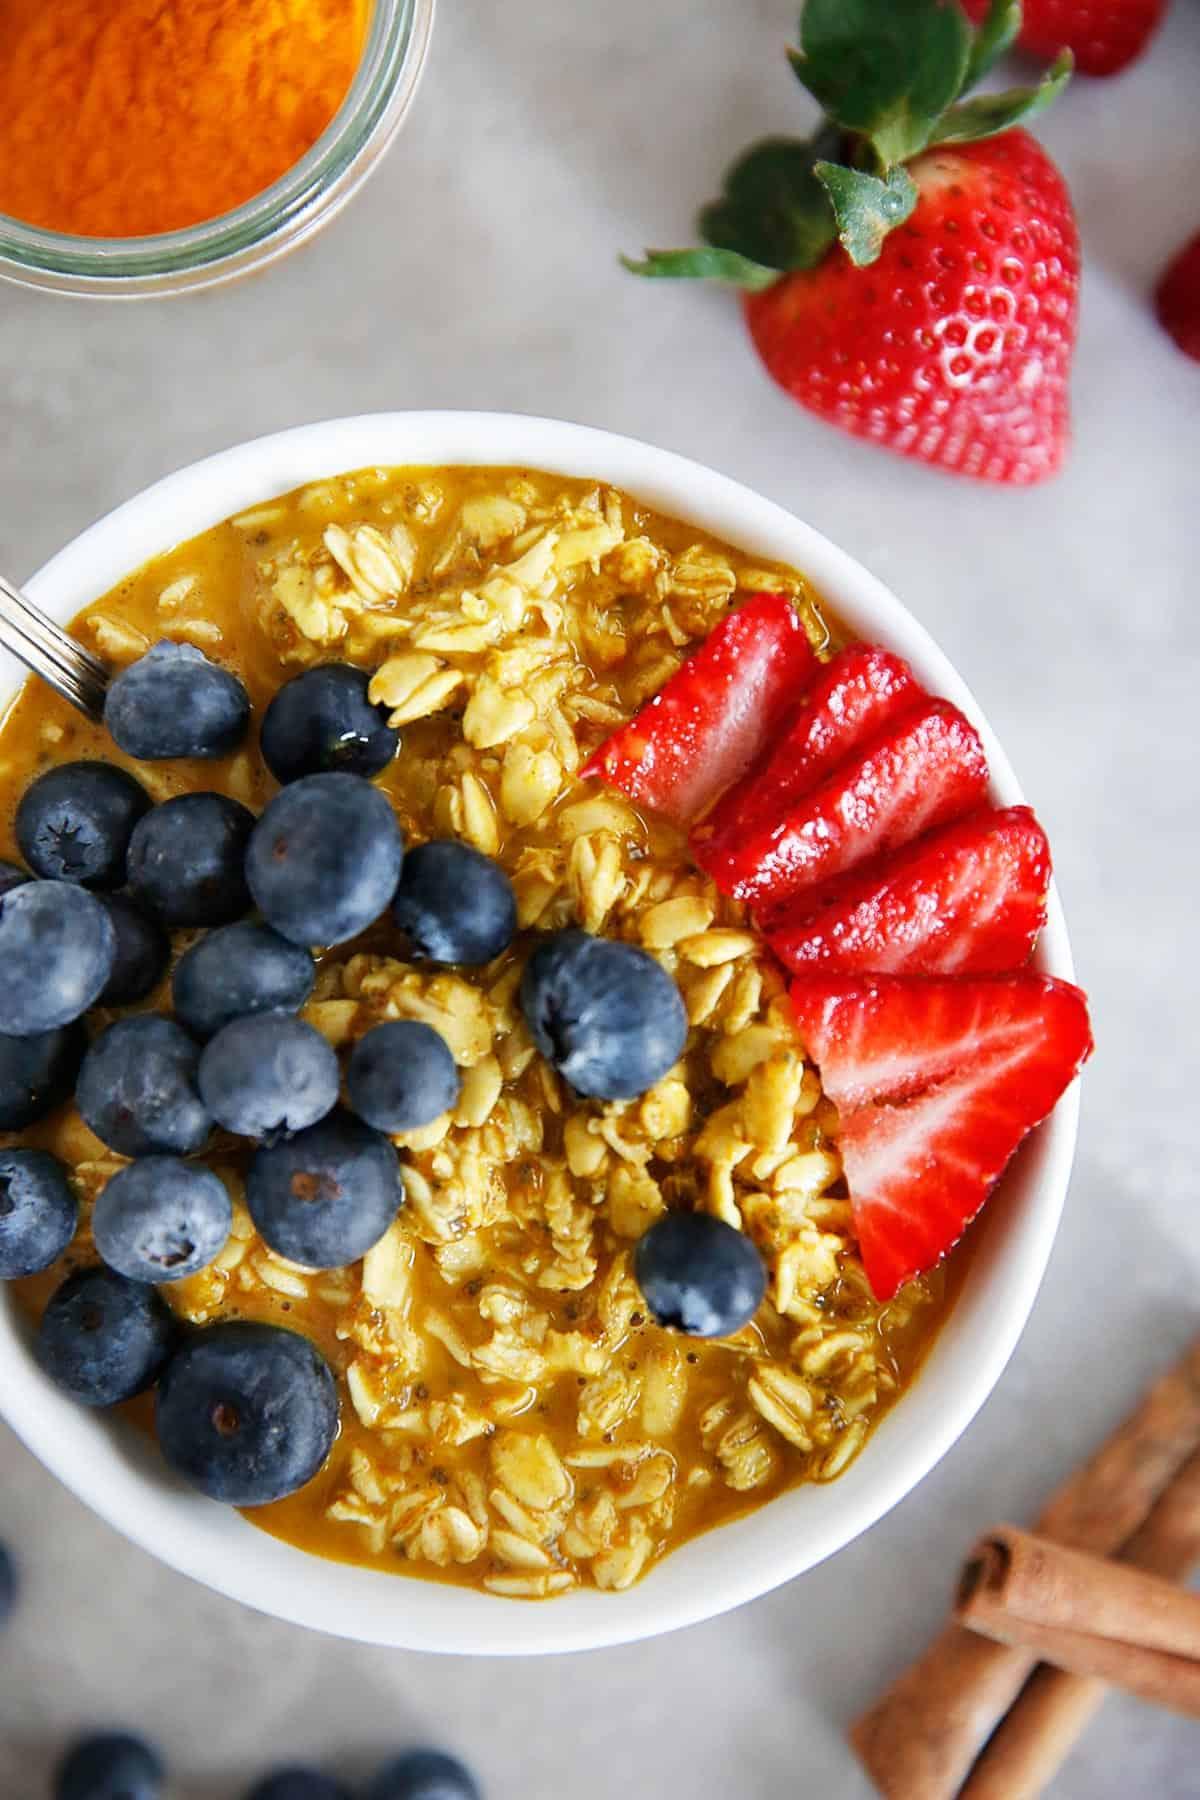 Healthy turmeric overnight oats